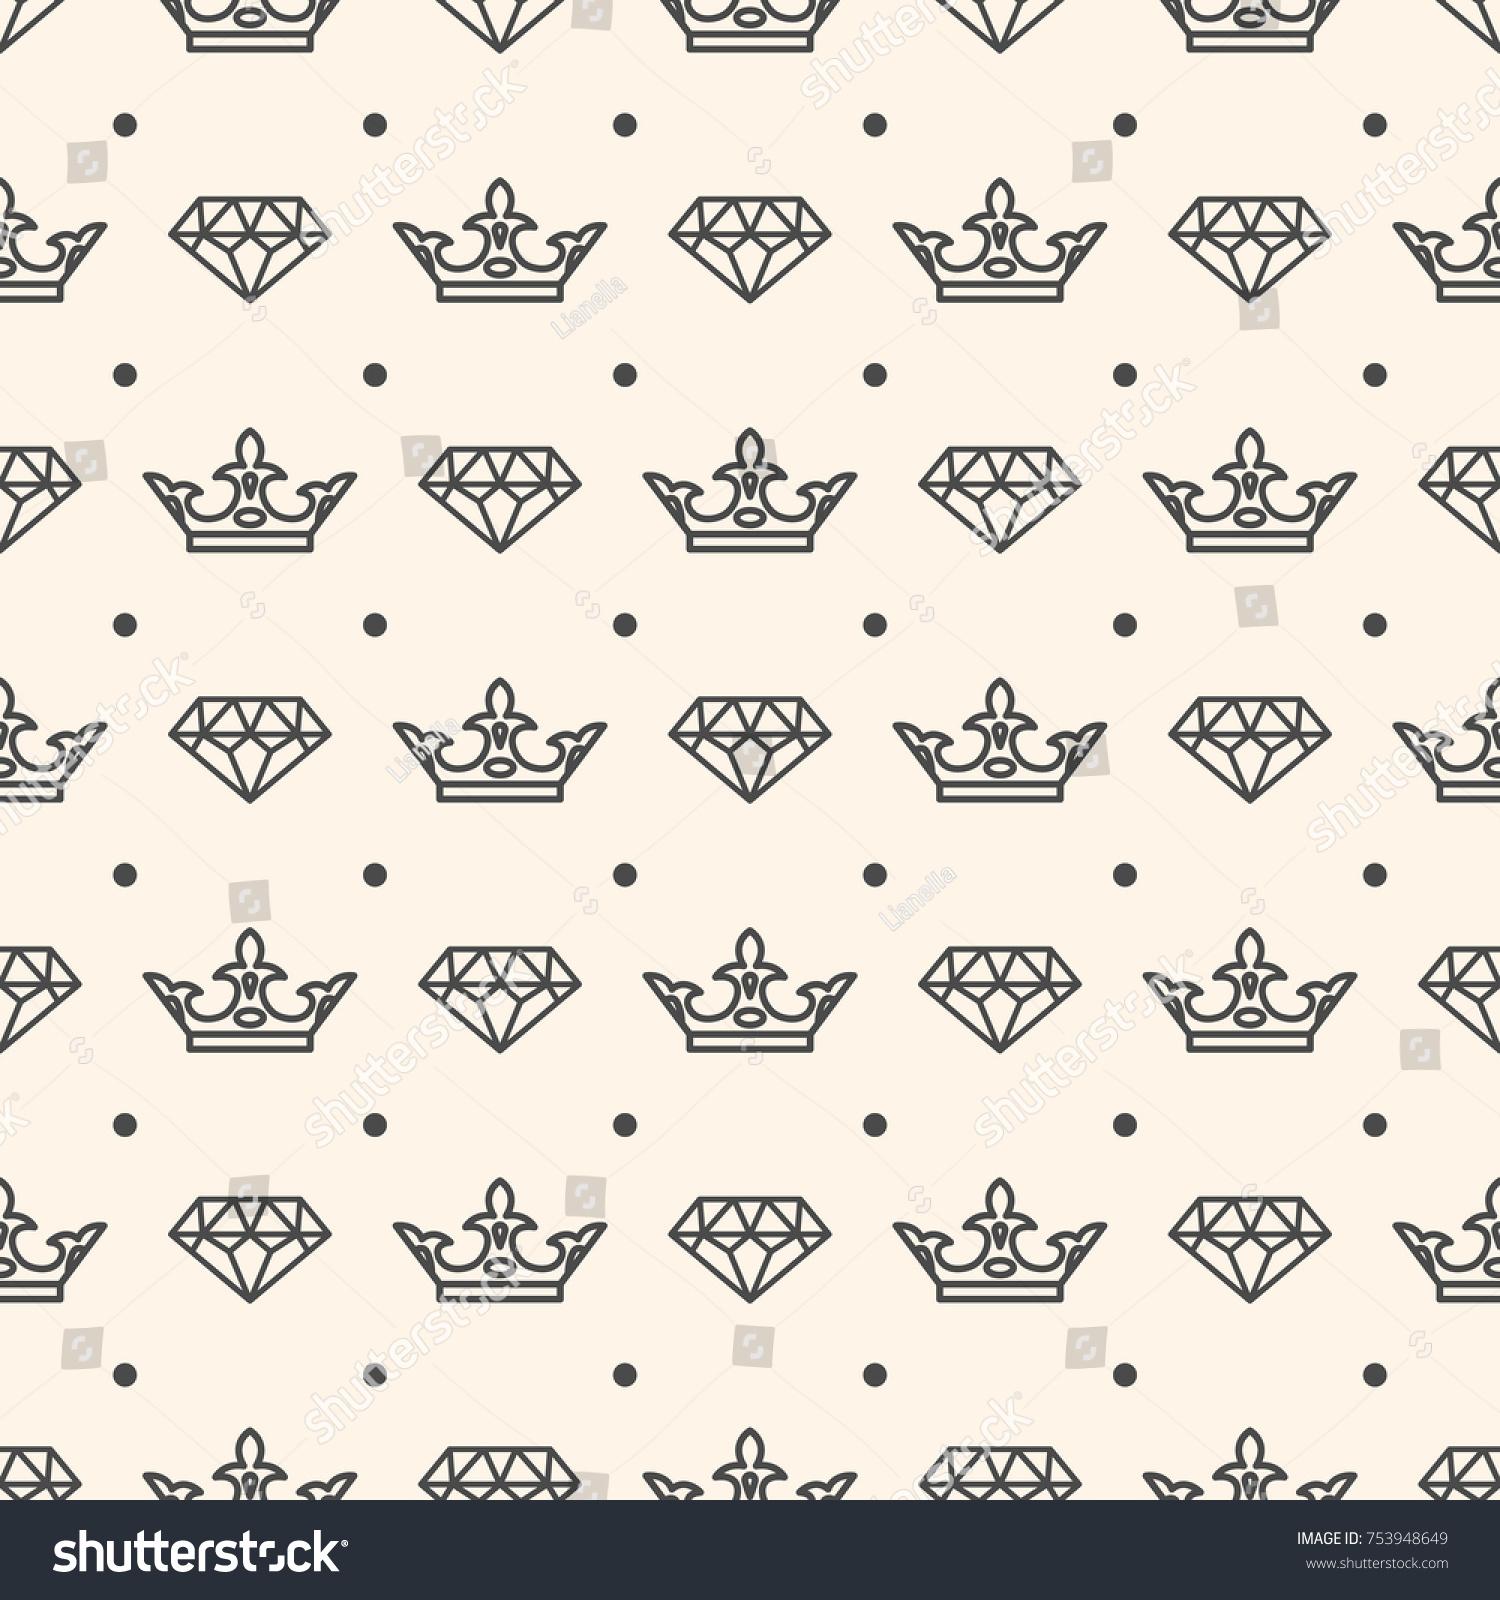 Seamless pattern crown diamond symbols wedding stock illustration seamless pattern with crown and diamond symbols for wedding card or invitation decoration elegant fashion biocorpaavc Choice Image